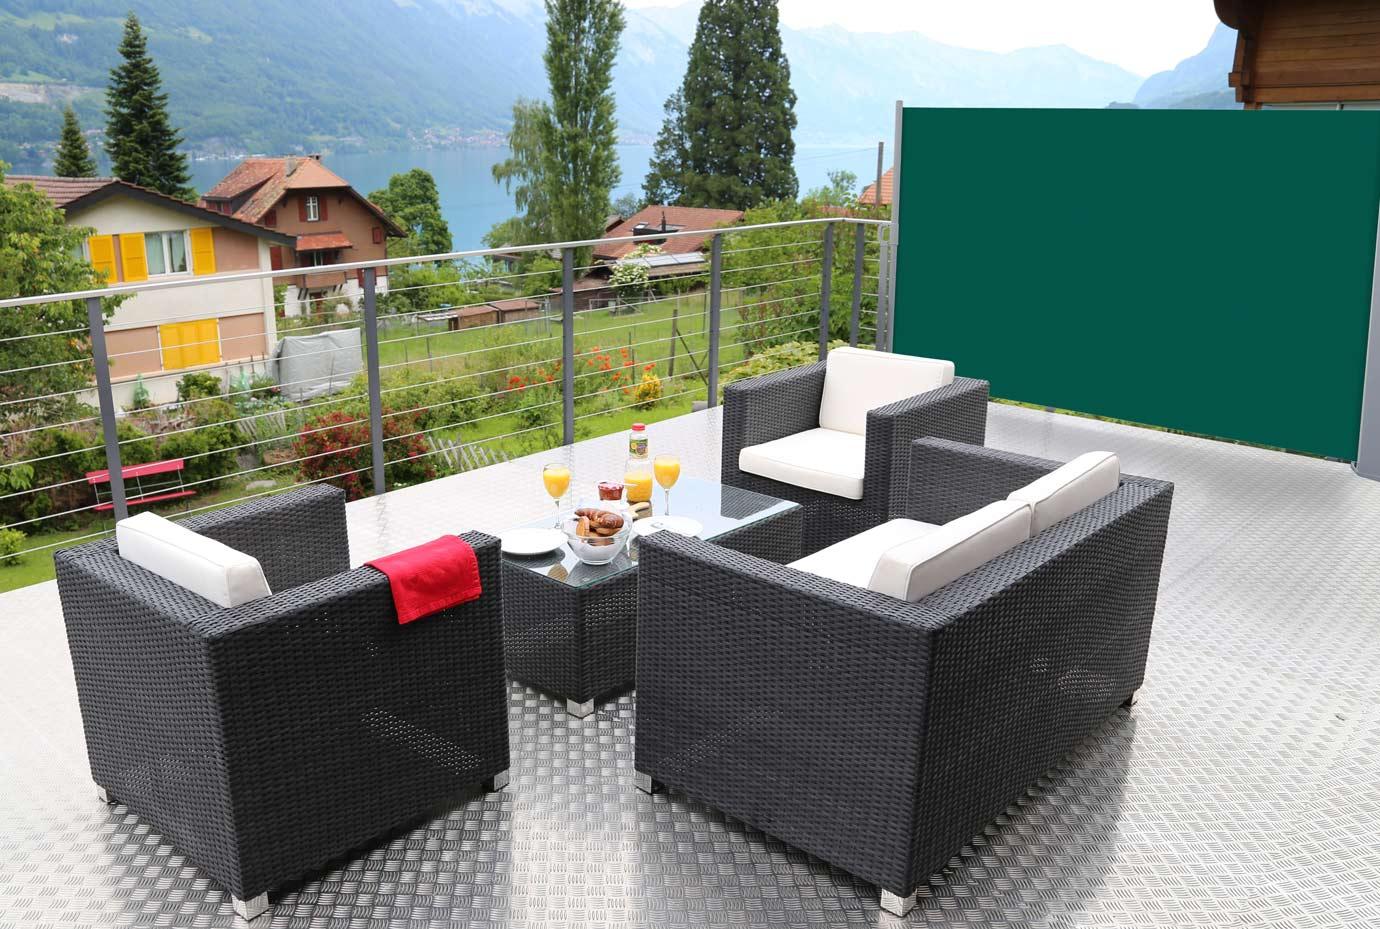 Nemaxx store lat ral abri soleil balcon terrasse - Protege soleil terrasse ...